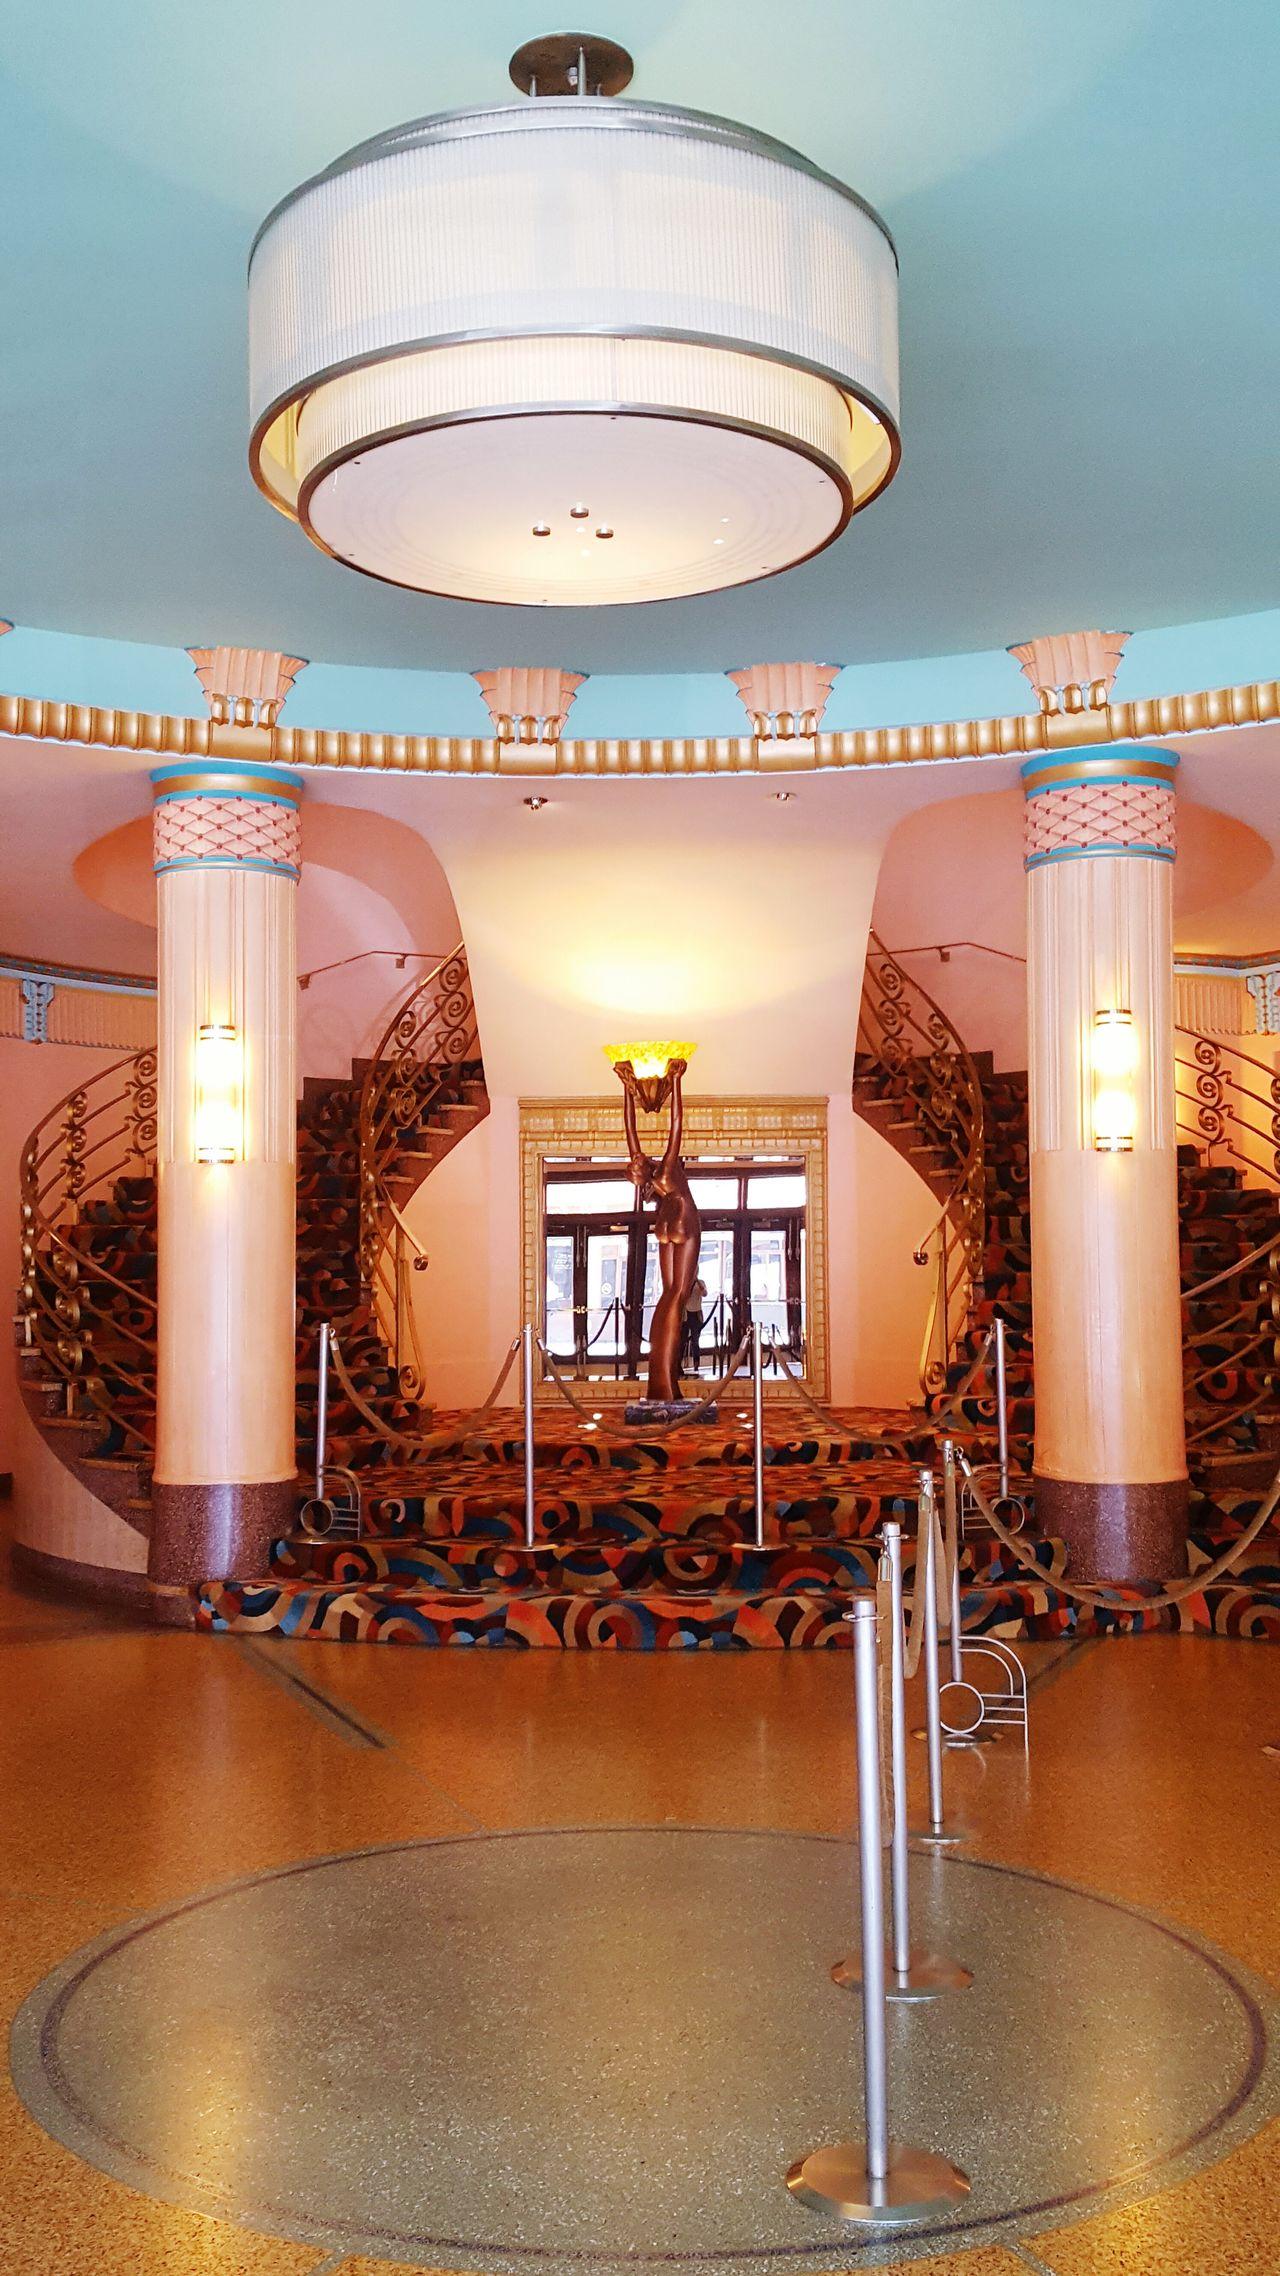 Sea Night Illuminated Rollercoaster No People Amusement Park Indoors  Water Moviescene Movies <3 Movie Time Moviestar Architecture Architectural Column